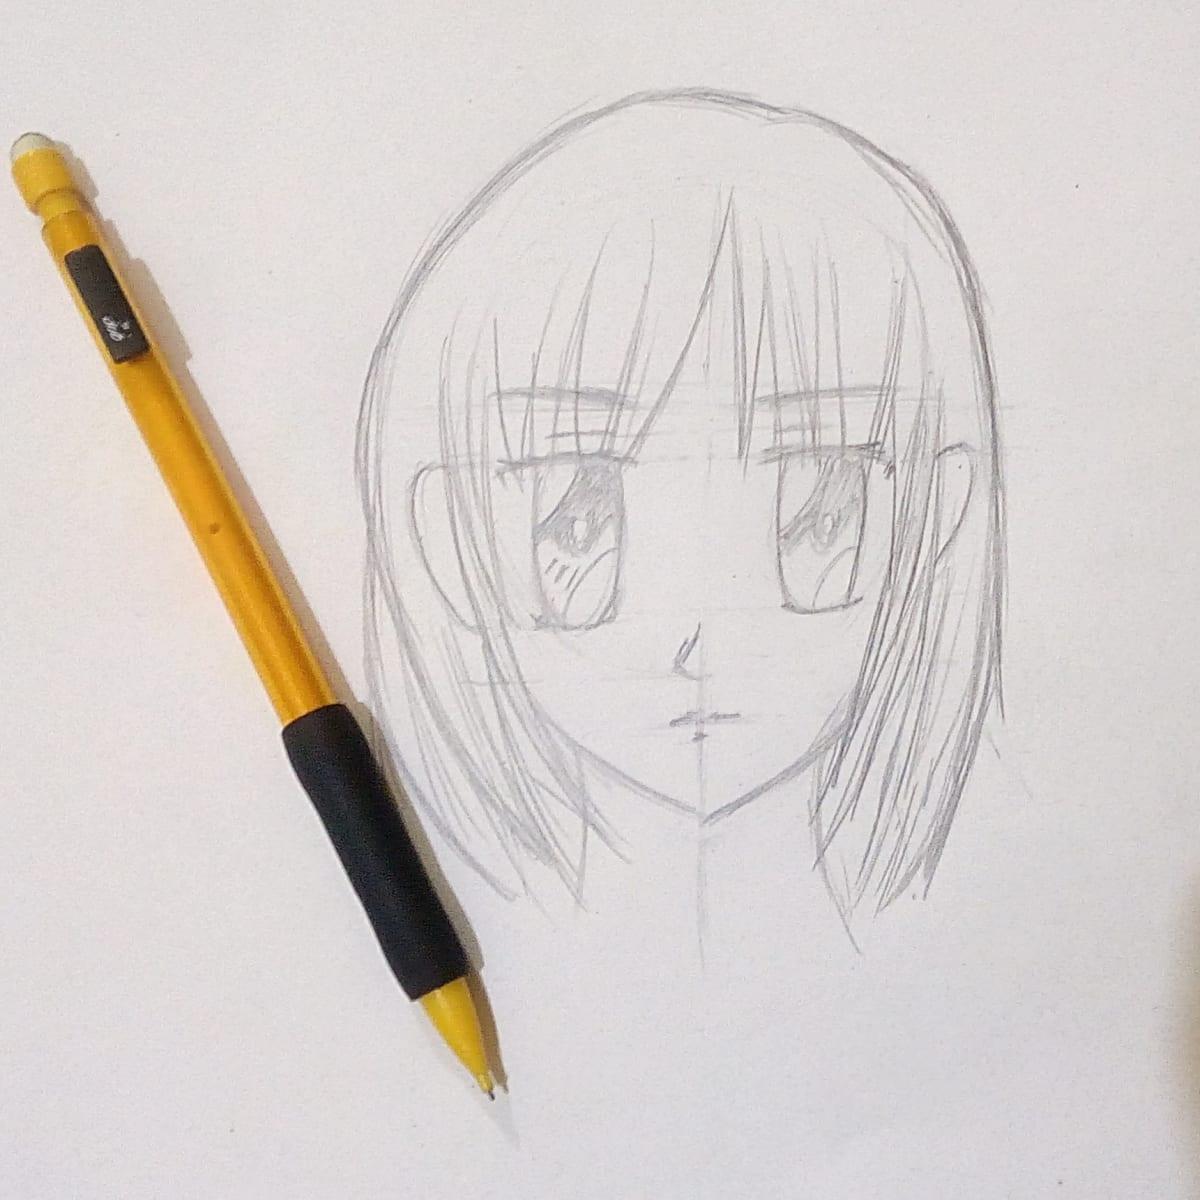 How To Draw An Anime Girl Face Shojo Feltmagnet